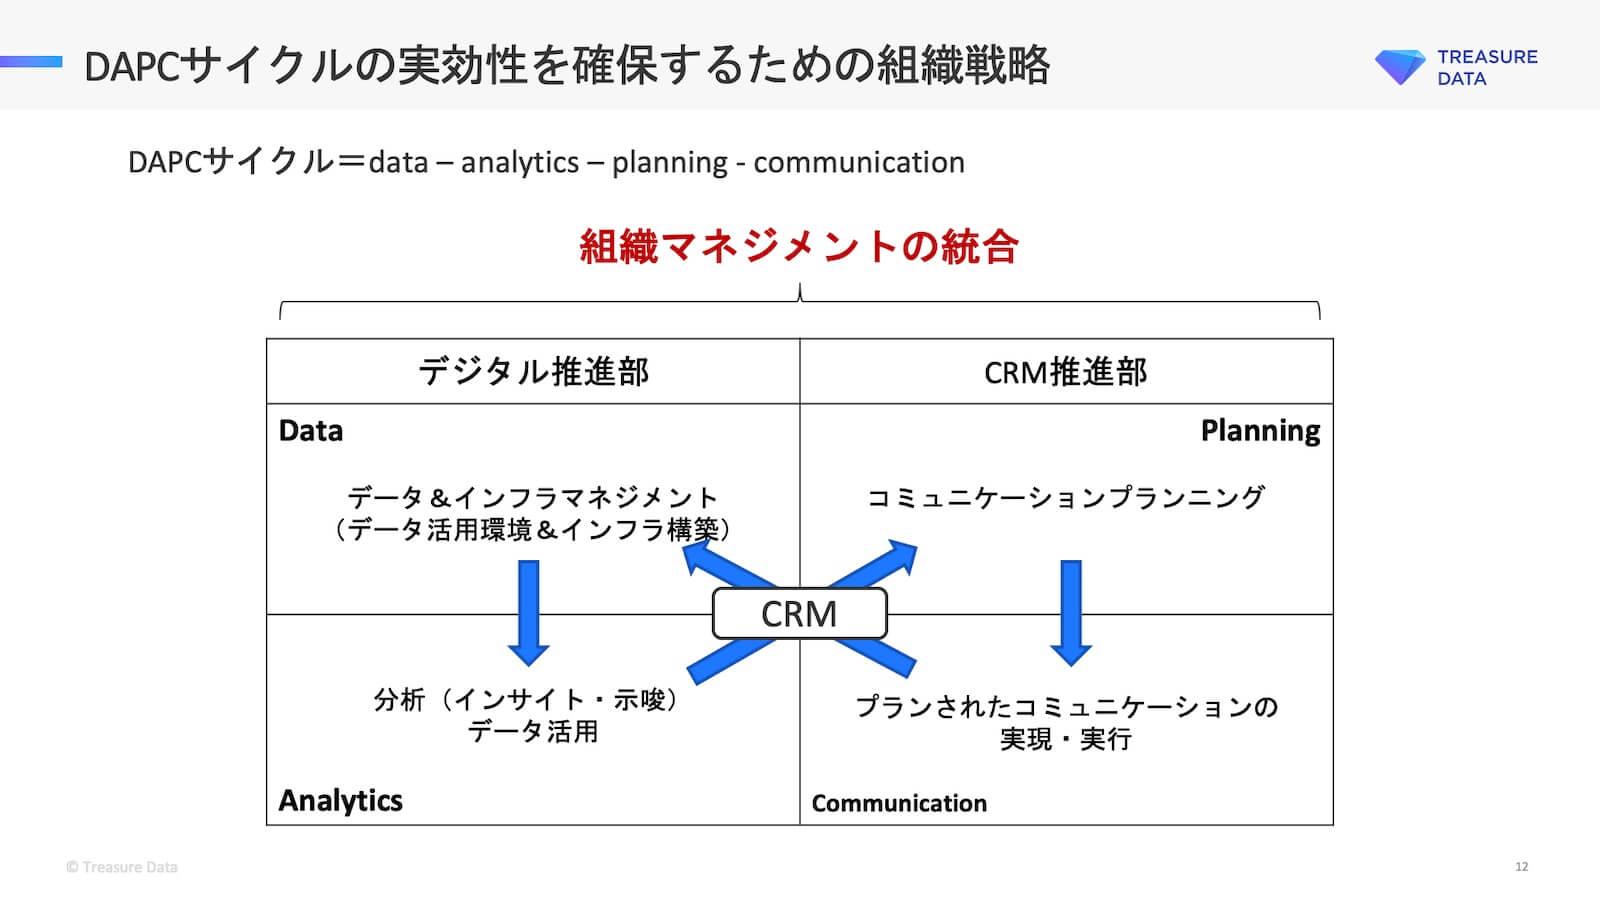 DAPCサイクルの実効性を保持するための組織戦略